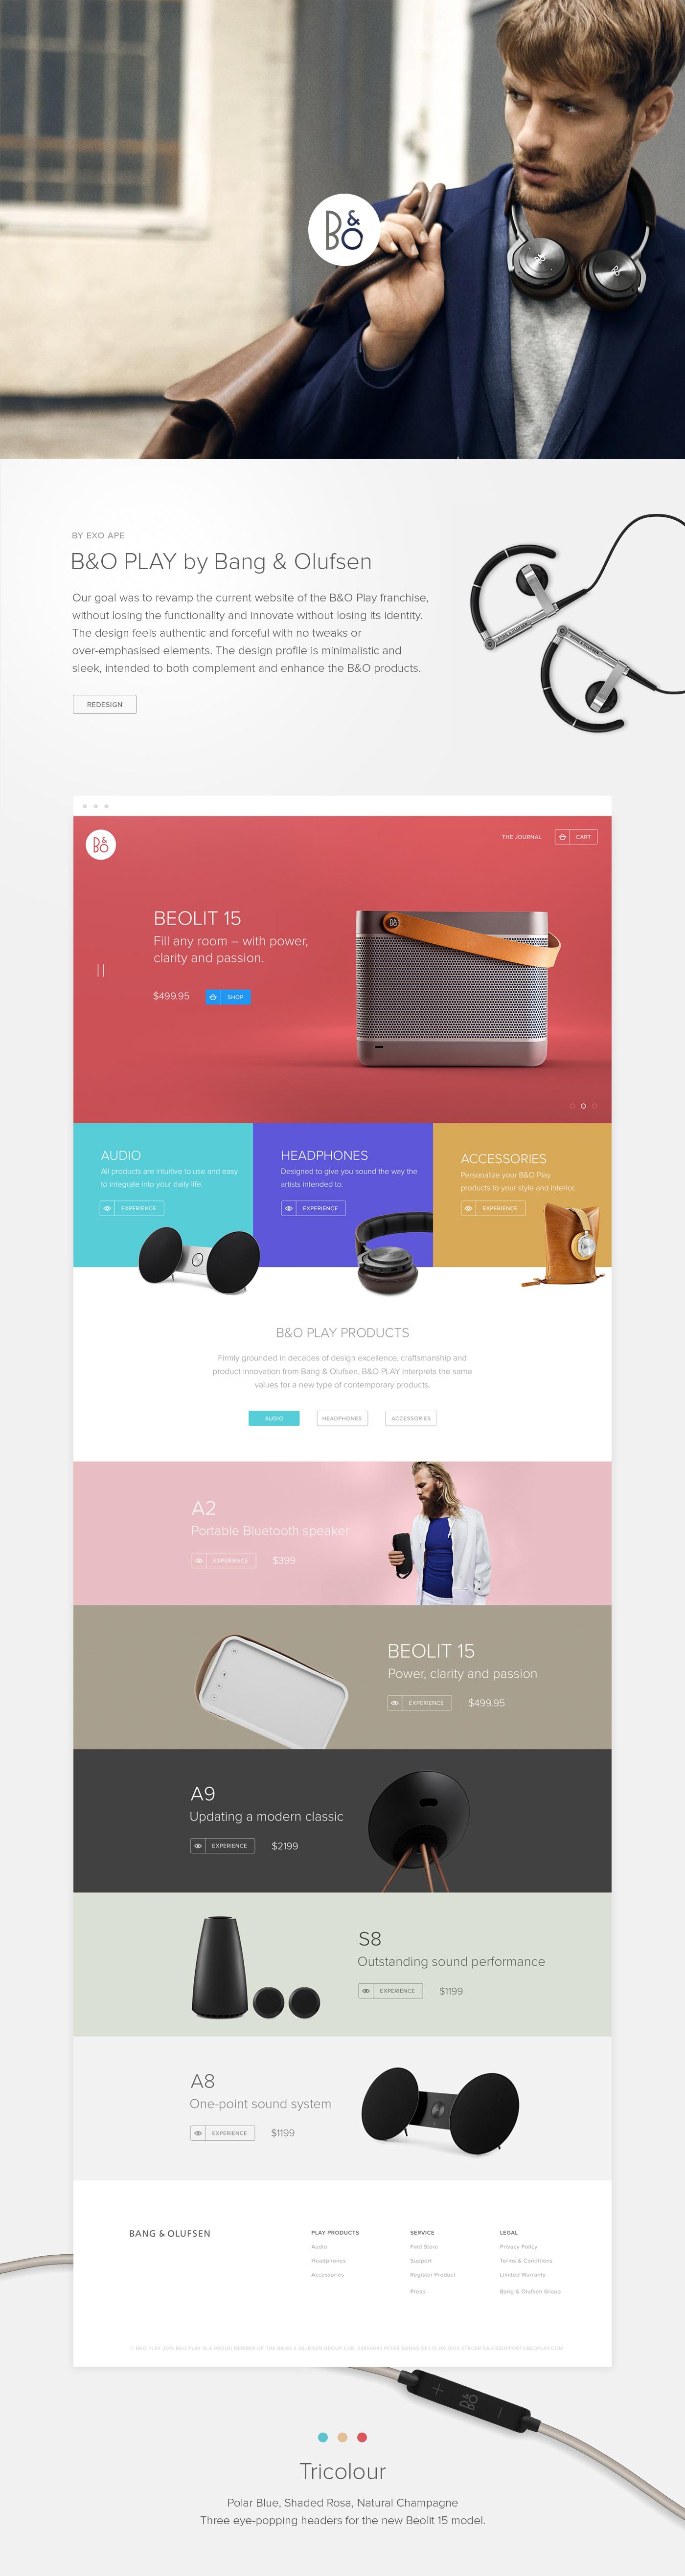 Pin By 30 On Etc Web App Design Web Design Interactive Design